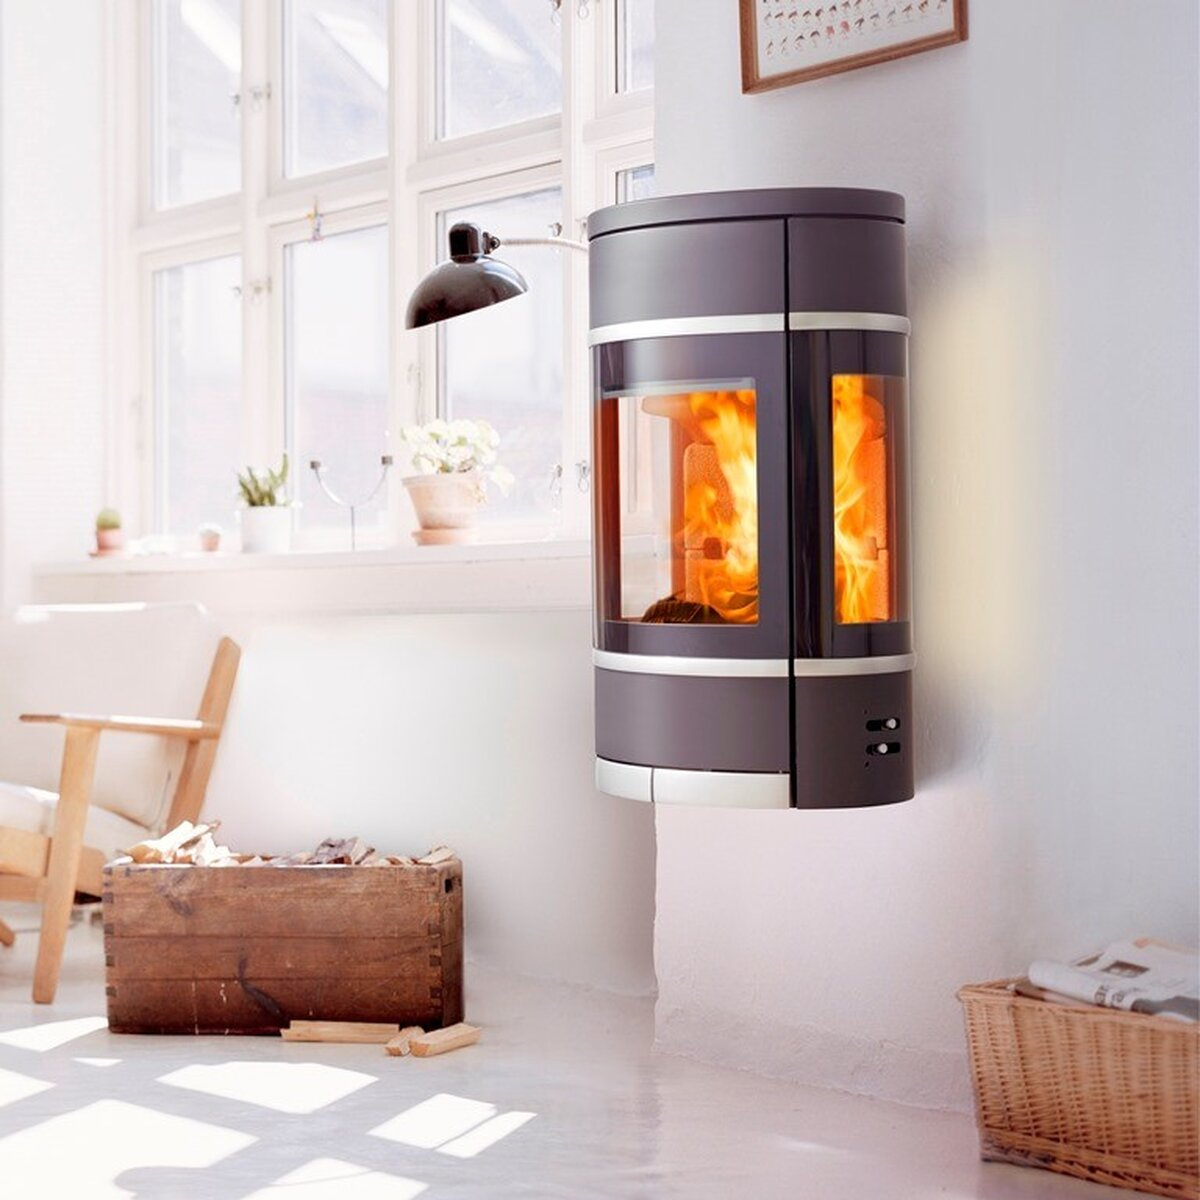 kaminofen scan 68 2 wall online kaufen feuer fuchs 2. Black Bedroom Furniture Sets. Home Design Ideas